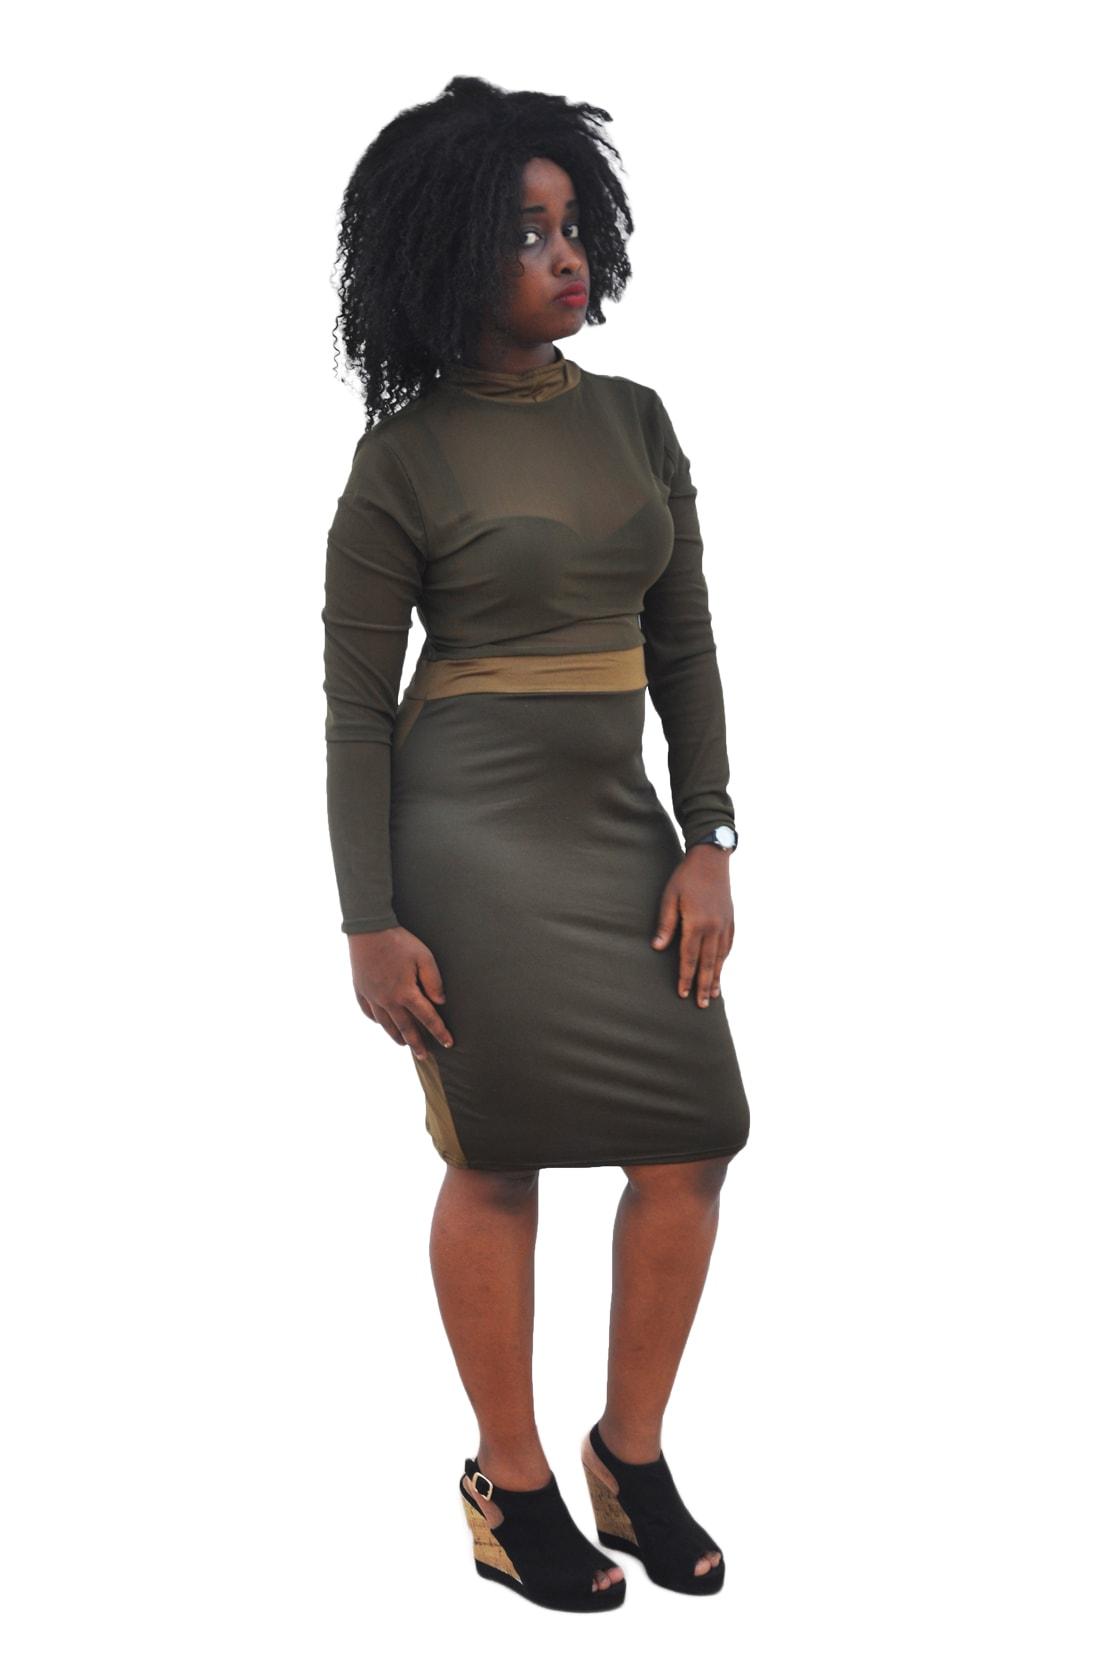 M0210 olive1 Midi Medium Dresses maureens.com boutique